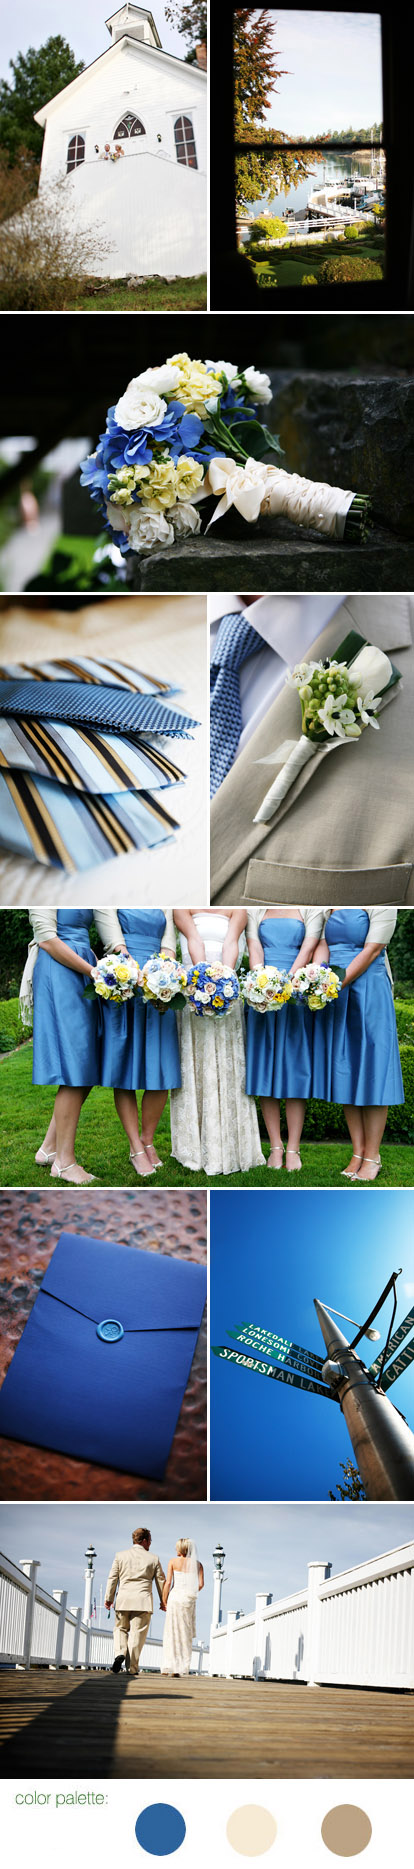 Casual Pacific Northwest San Juan Island wedding , blue, cream and khaki wedding colr palette, images by Riso Studio